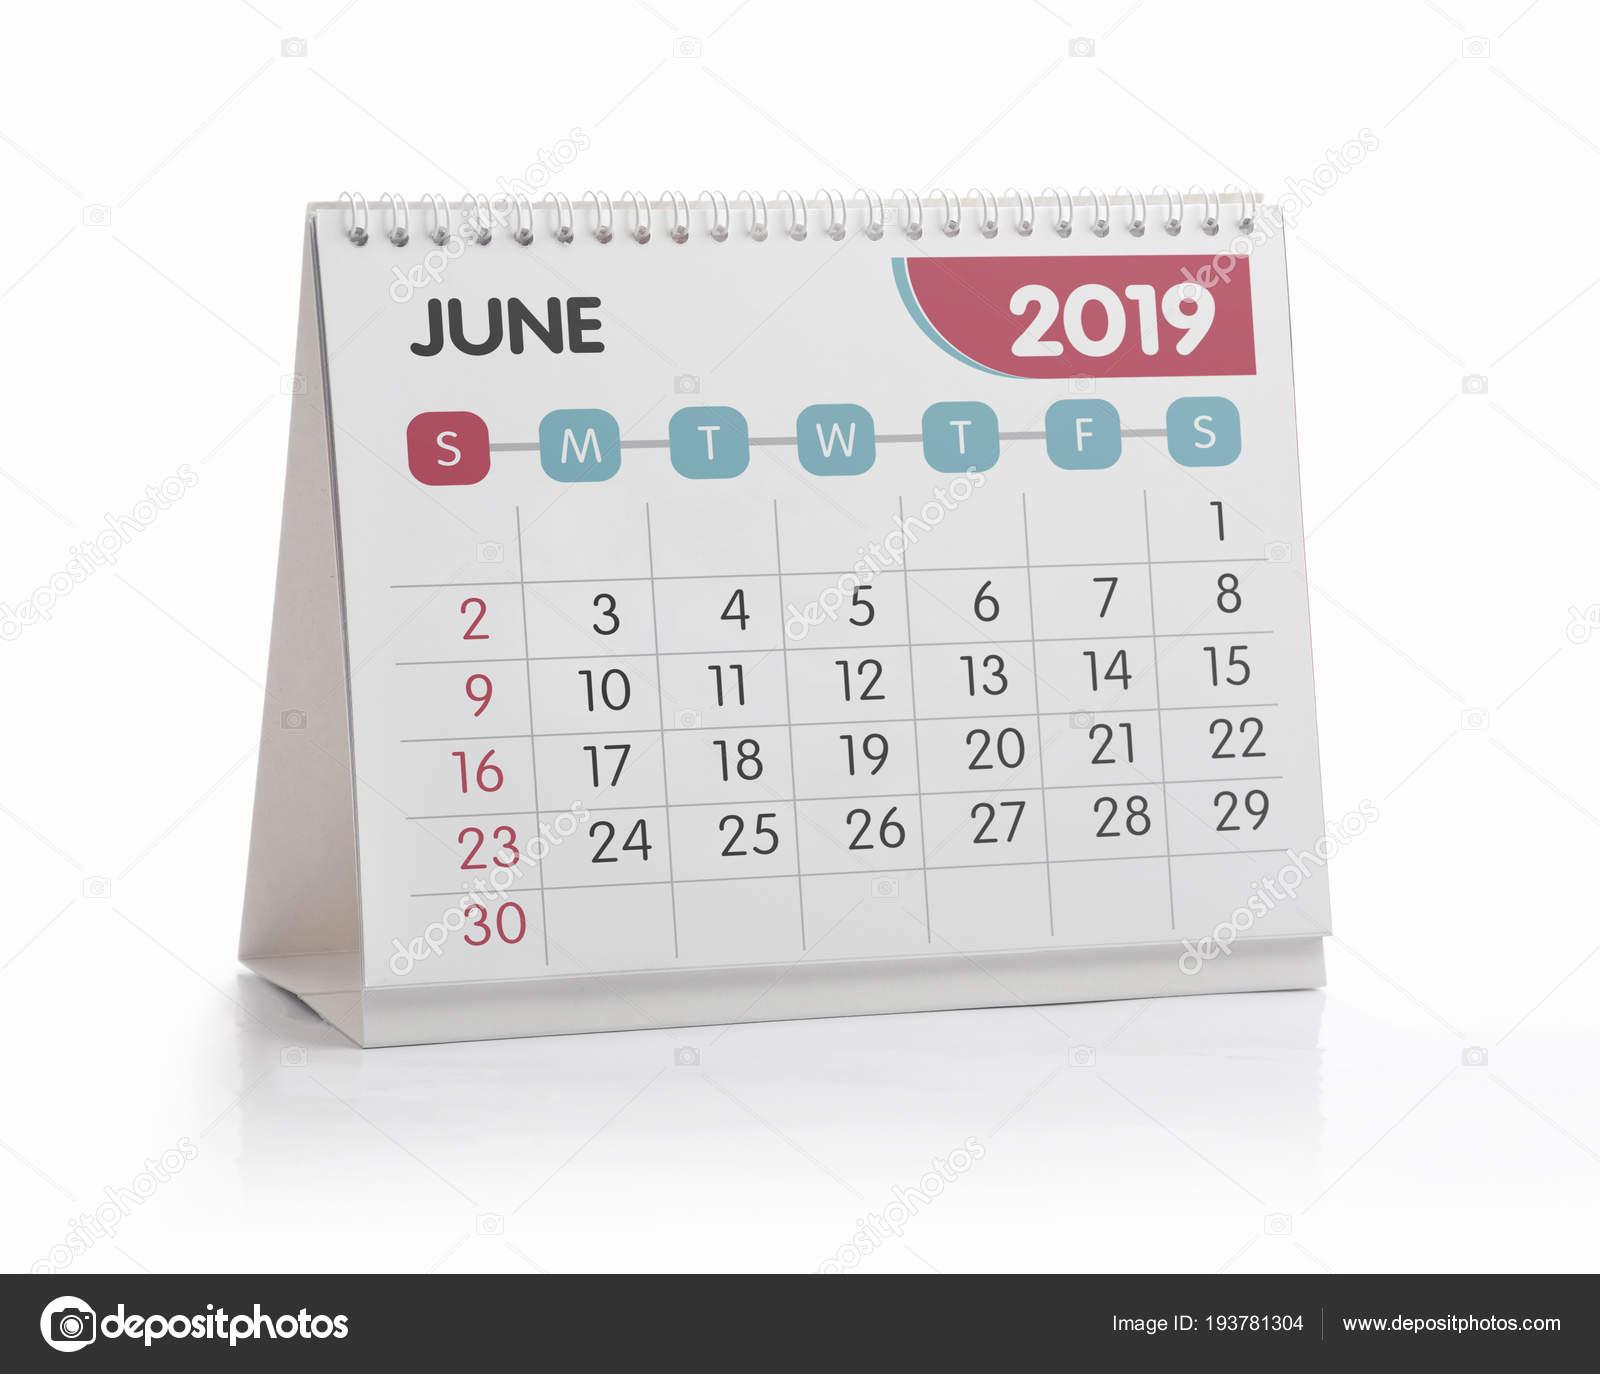 Junio Calendario 2019.Oficina Calendario 2019 Junio Fotos De Stock C Midosemsem 193781304